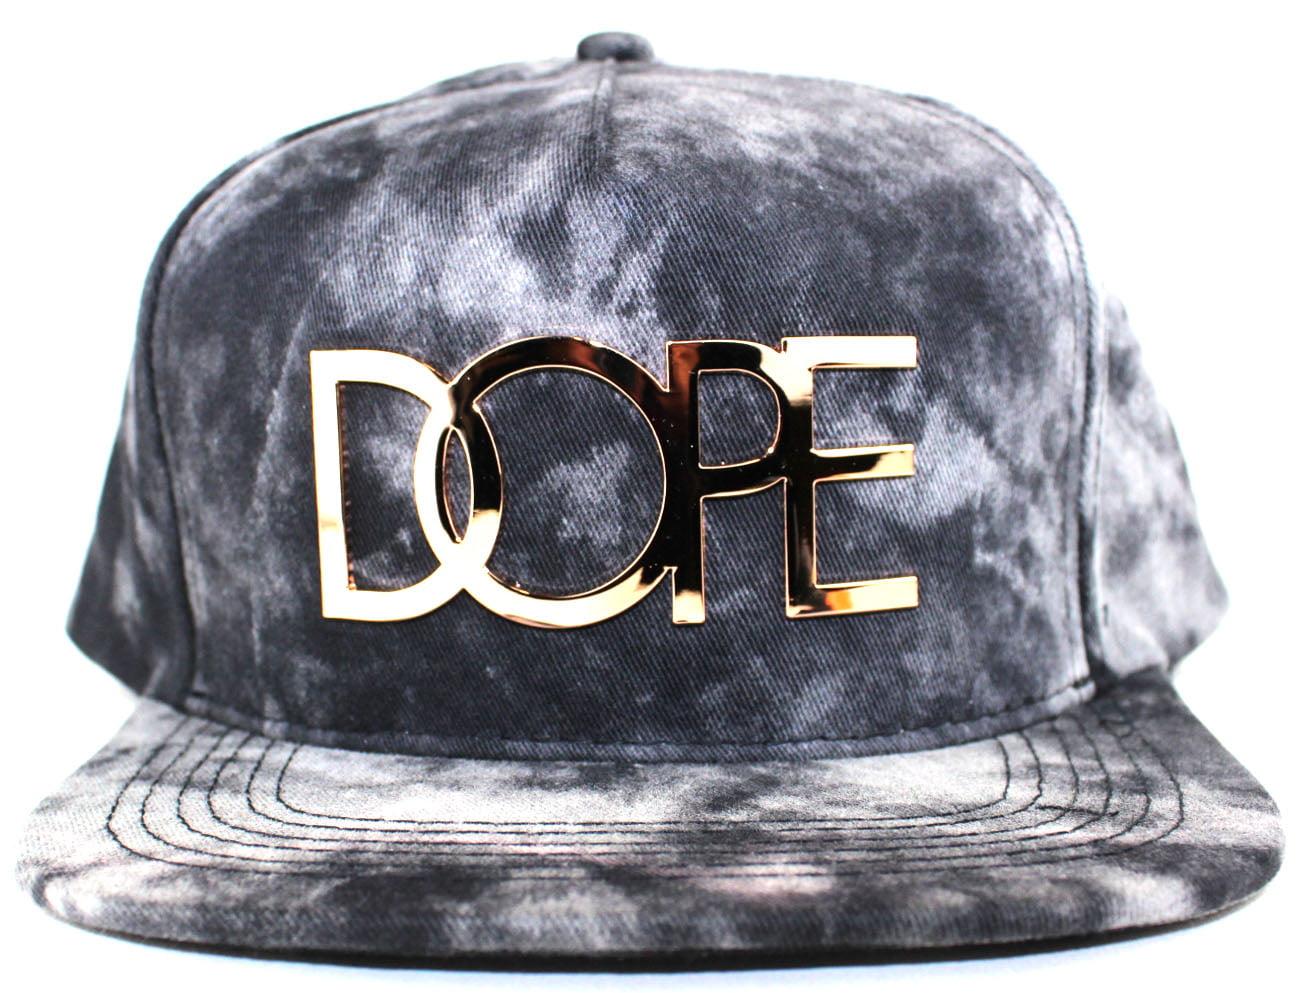 big sale a0454 75e77 canada dope leather snapback hats black gold leather leop 3d139 92d11   netherlands dope crystal wash gold logo snapback baseball cap black white  79735 1e83f